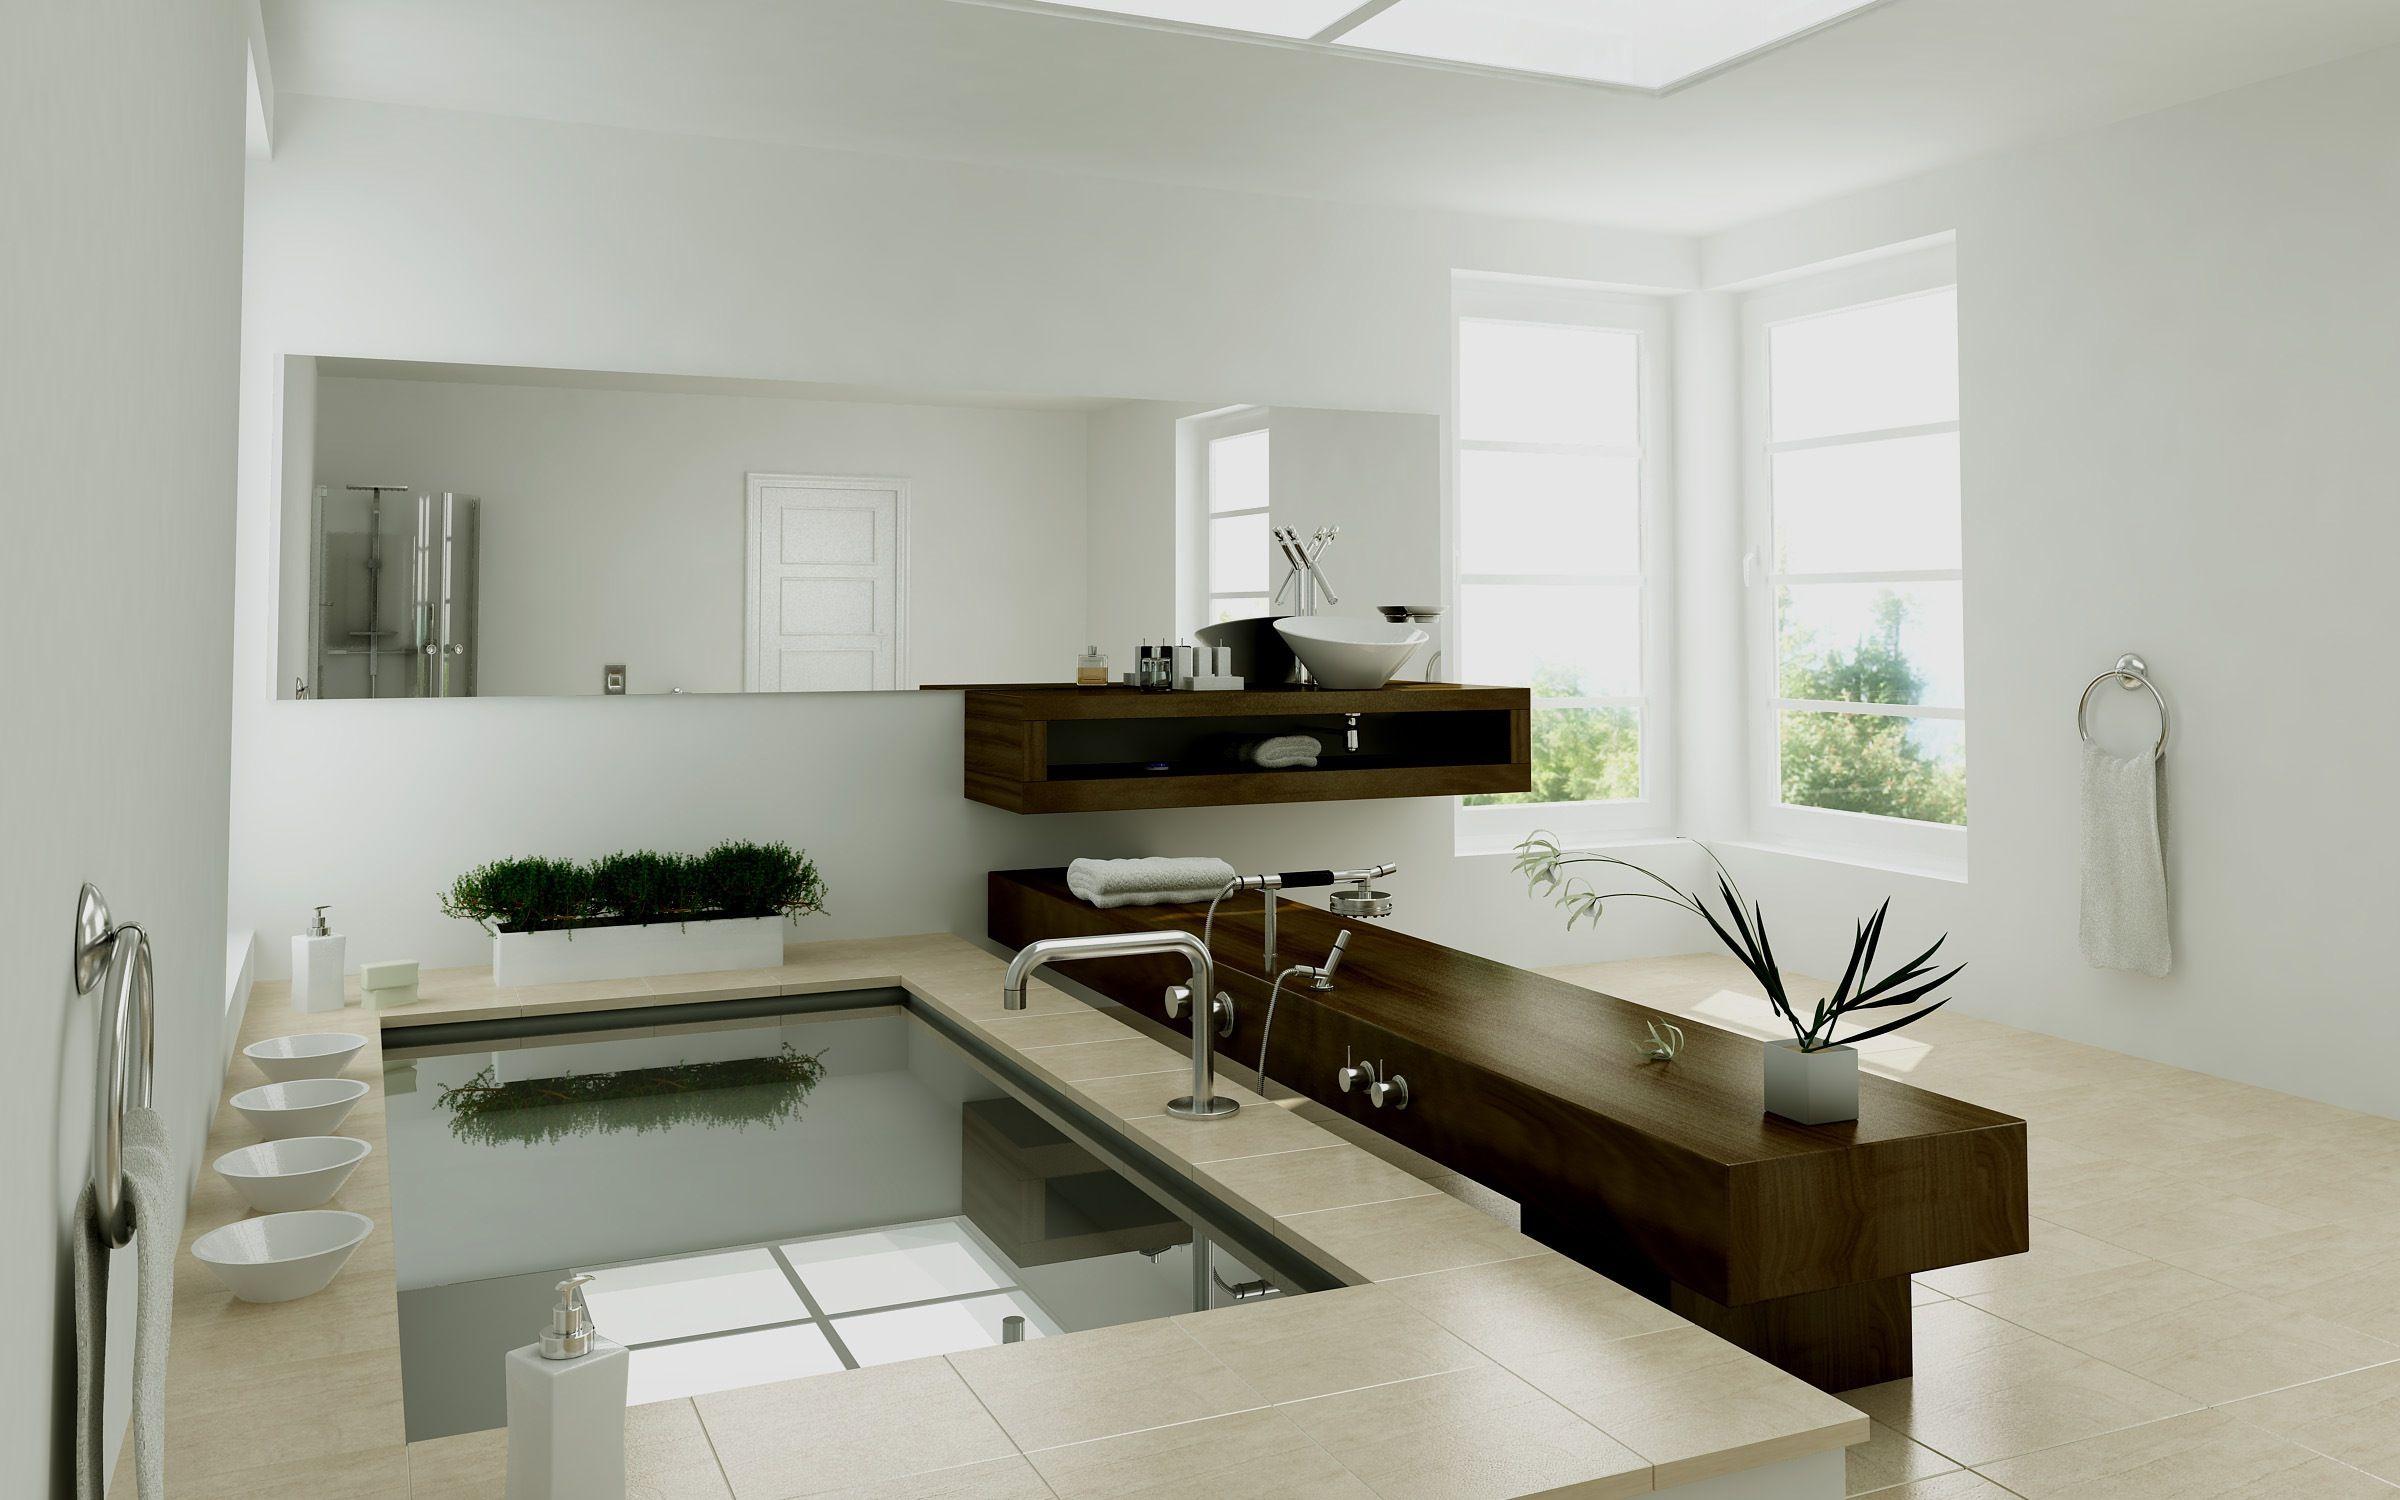 Sample Bathroom Rendering  Lumion Design Software  Pinterest Prepossessing Software For Bathroom Design Review